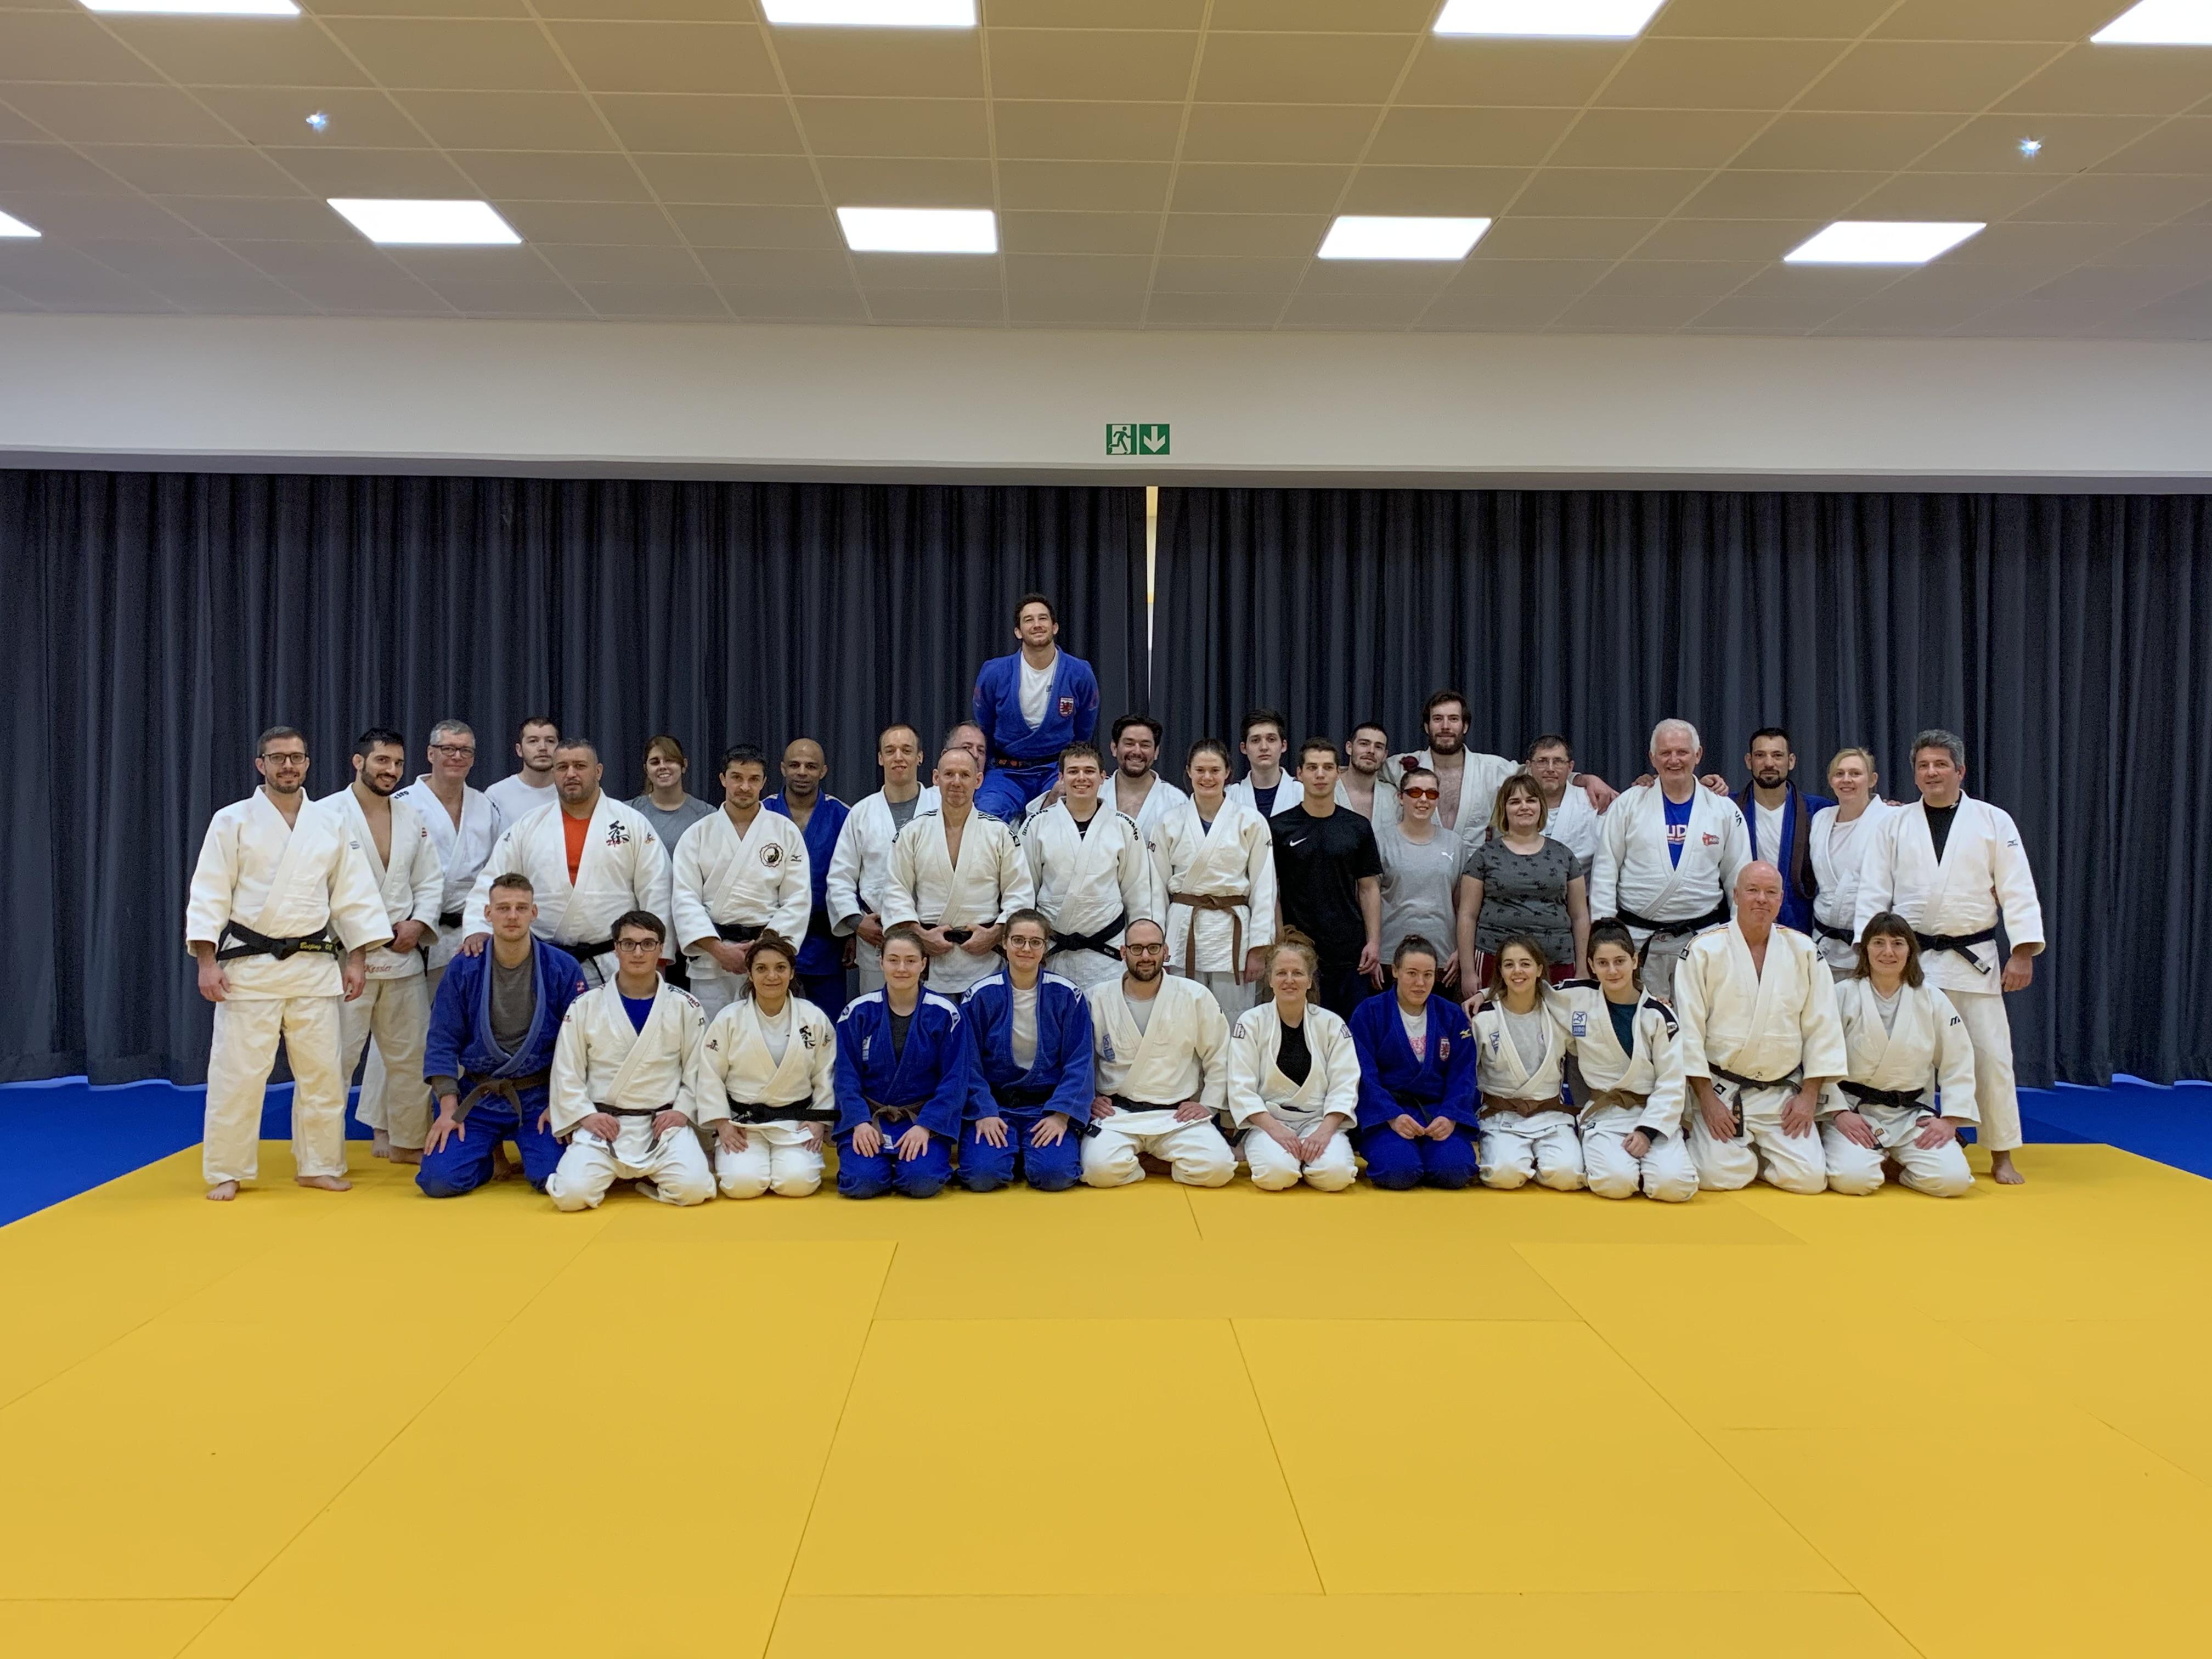 Interreg Judo Symposium LTAD - Luxembourg 17-19.01.2020